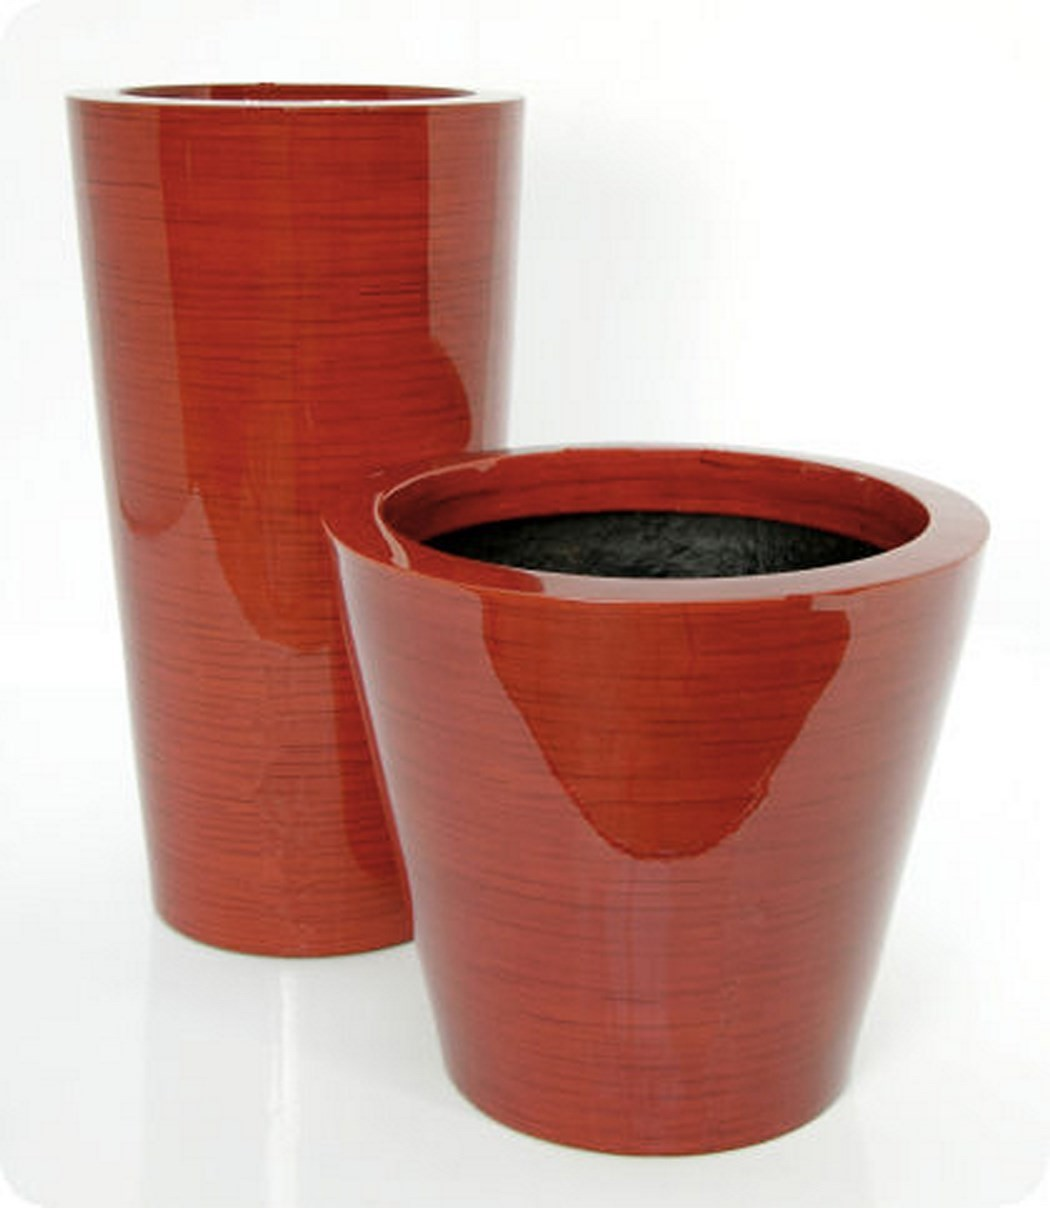 Krappa Bamboo Pflanzgefäß   Hochglanz Rot